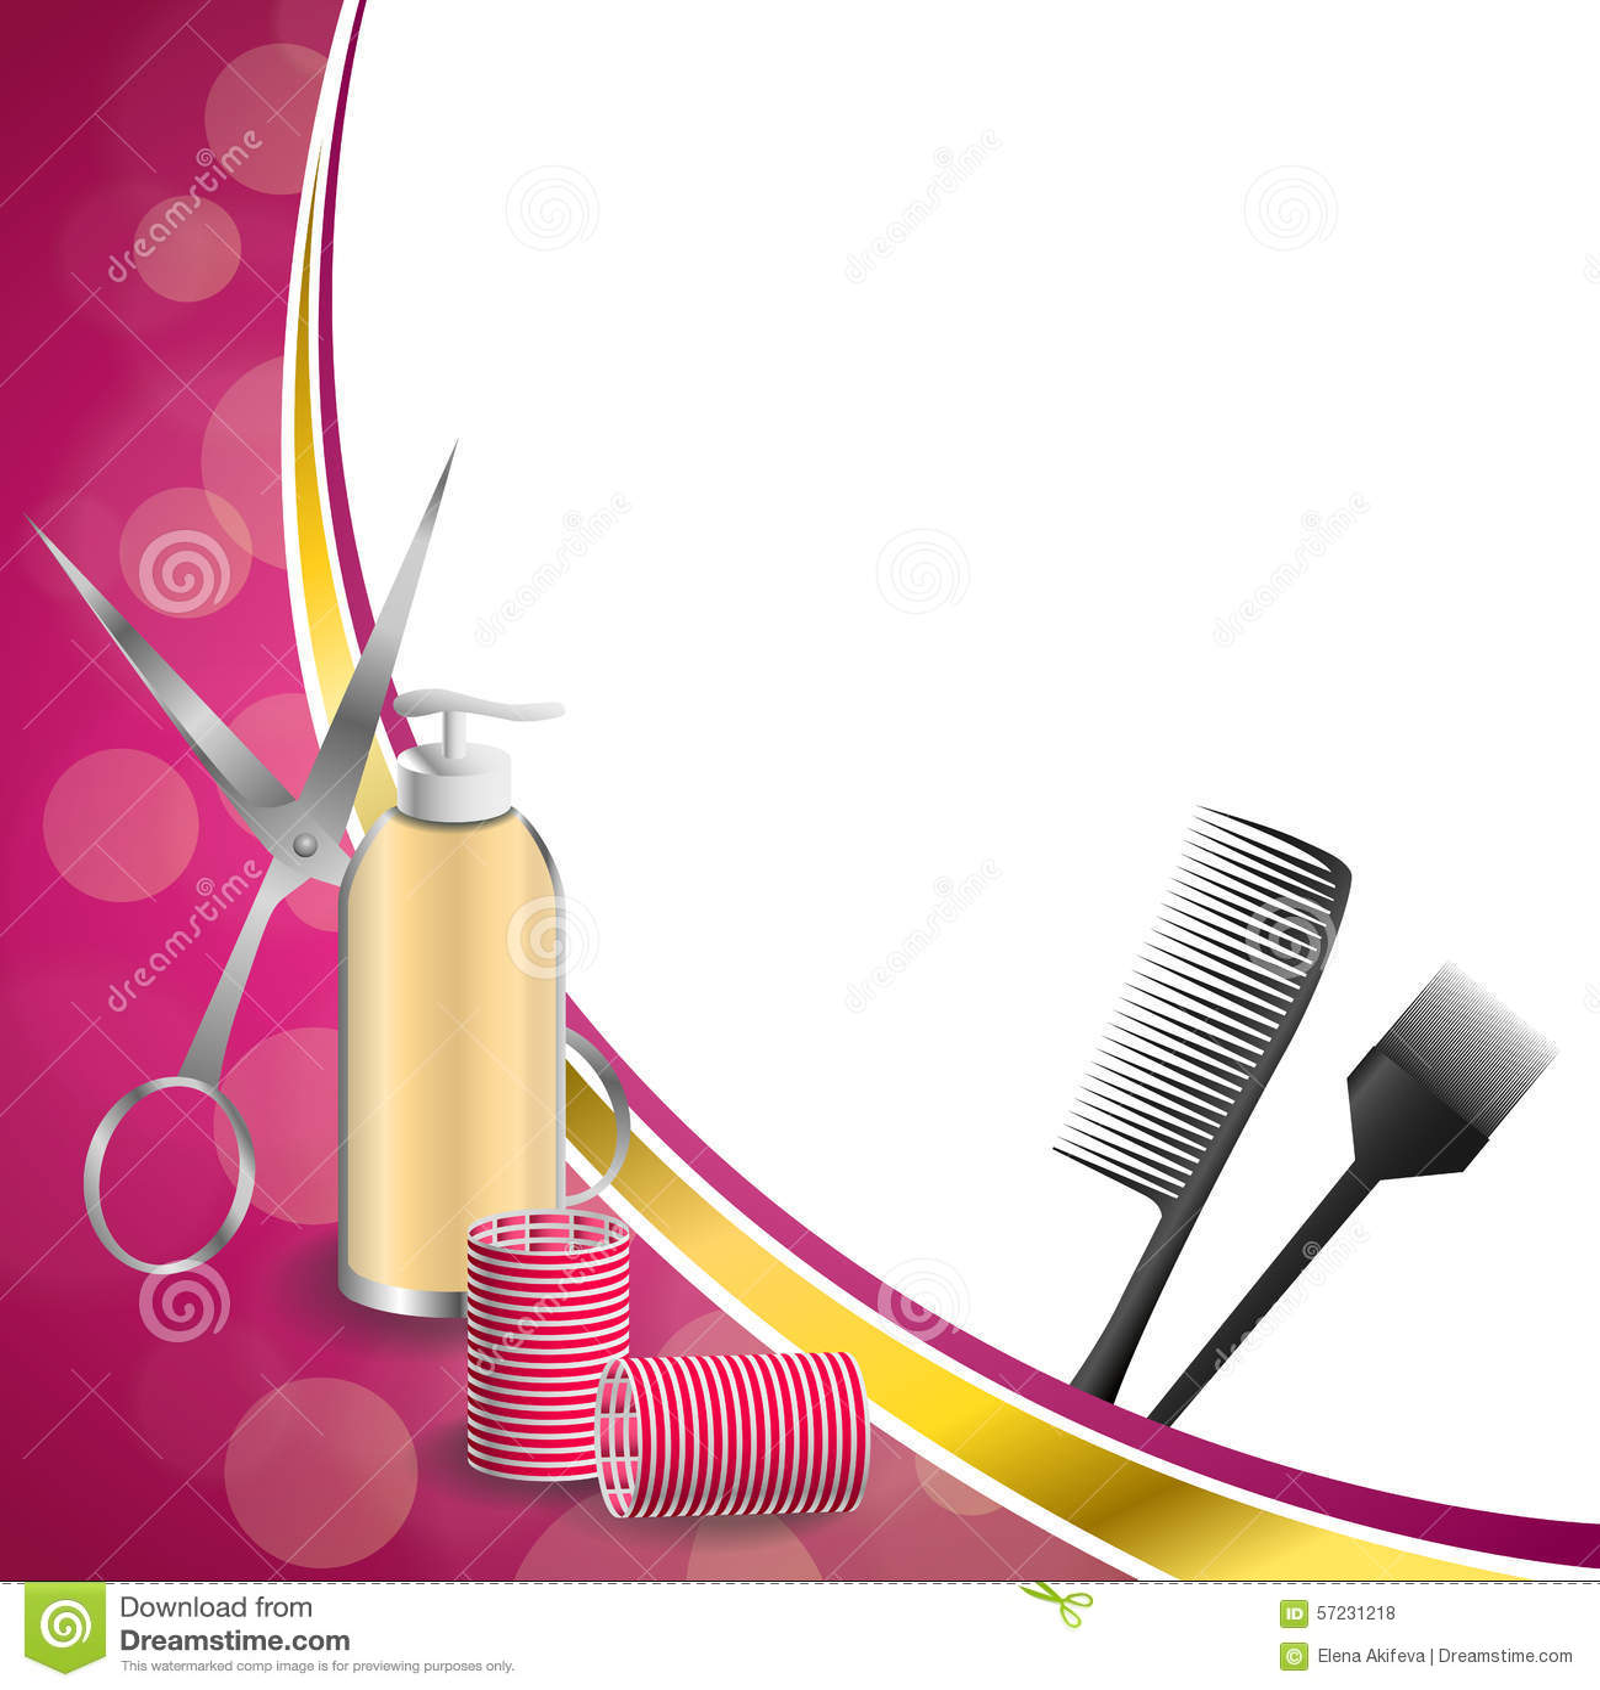 hair scissors wallpaper - photo #43